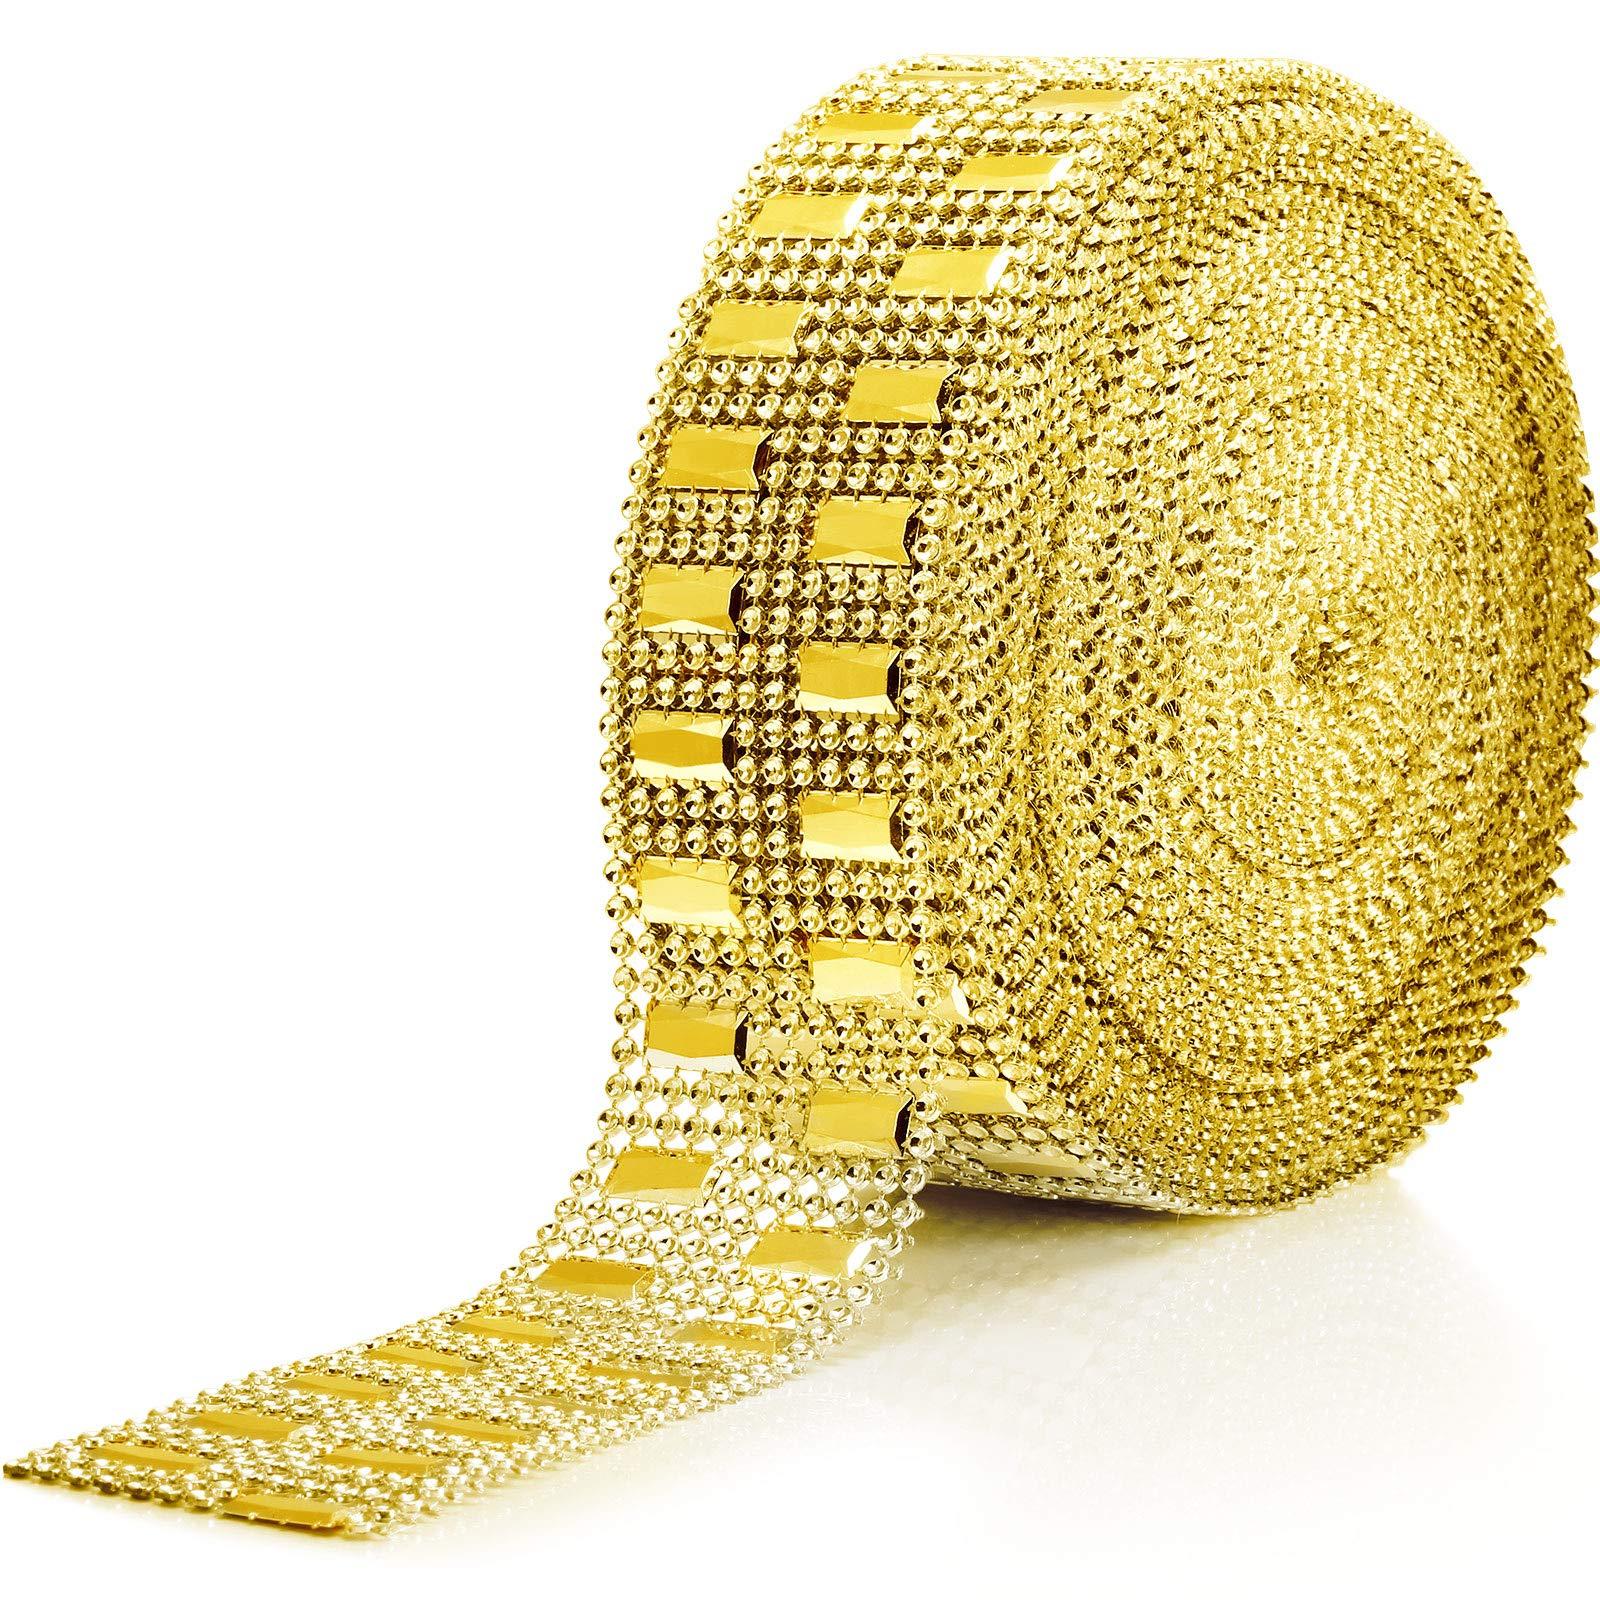 10 Yards Acrylic Rhinestone Diamond Ribbon Faux Diamond Bling Mesh Wrap for Wedding Cakes Birthday Decorations, Baby Shower and Craft Project (Gold, 2 Row)